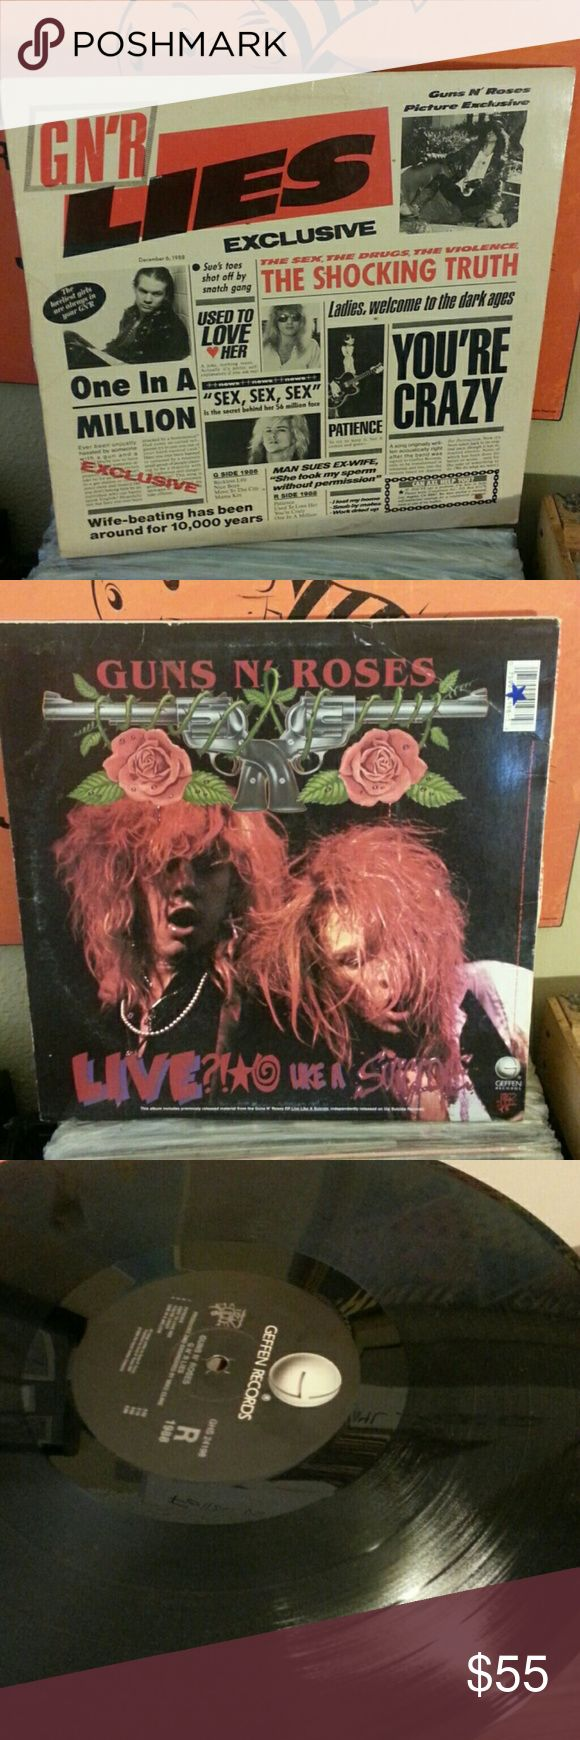 Guns n roses critical solution - Guns N Roses Lies Vinyl Record Lp Cover Vg Record Nm Vintage Other